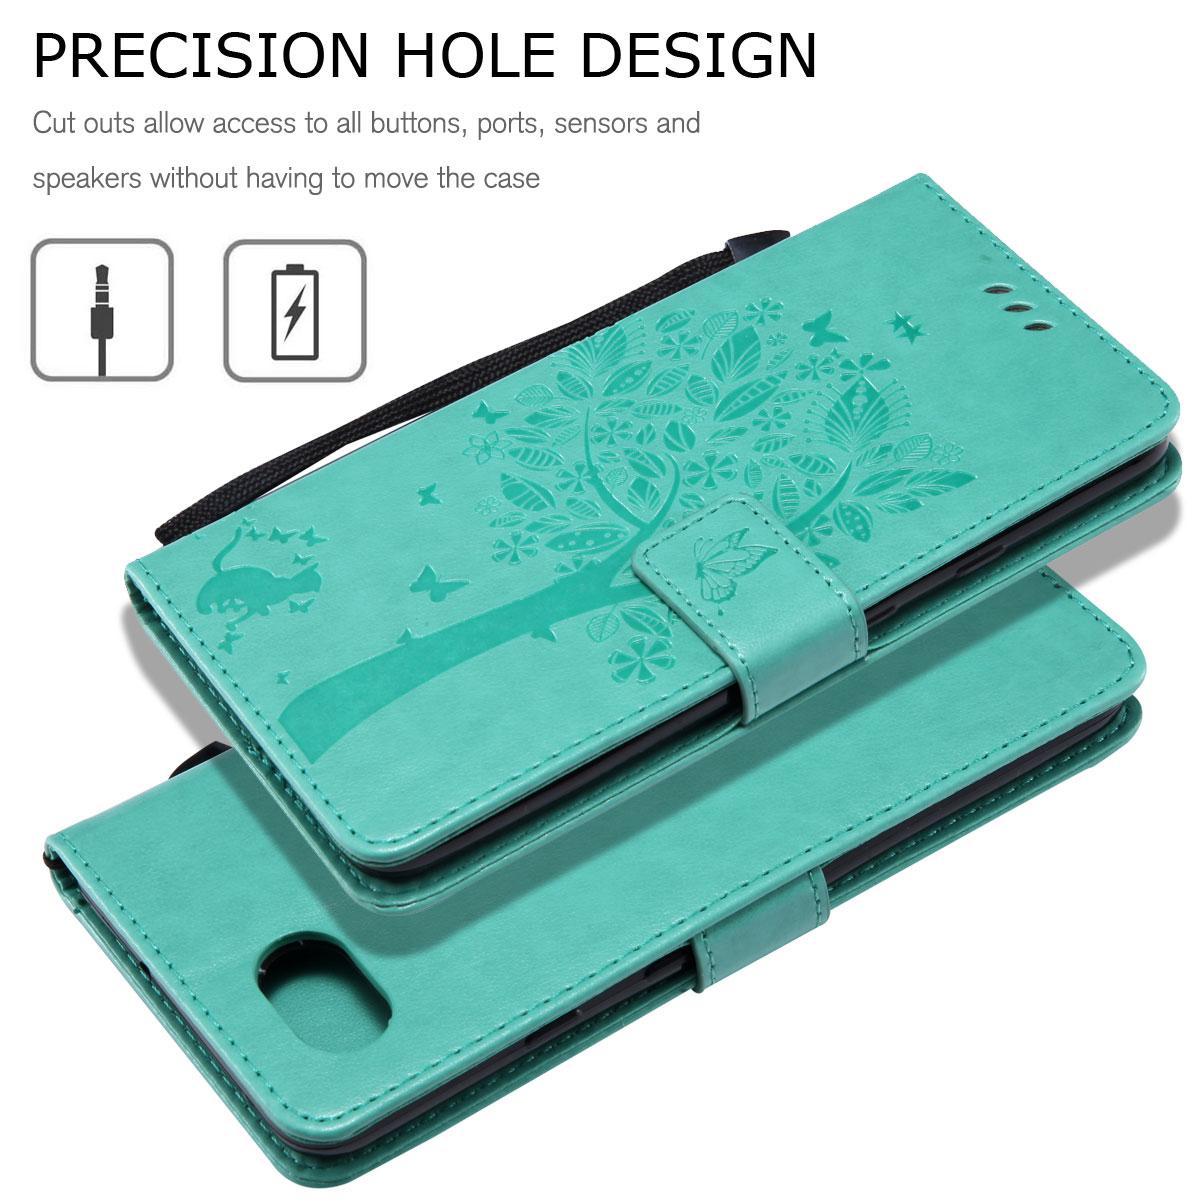 Magnetic-Leather-Credit-Card-Holder-Flip-Case-Cover-For-Google-Pixel-2-2-XL thumbnail 87